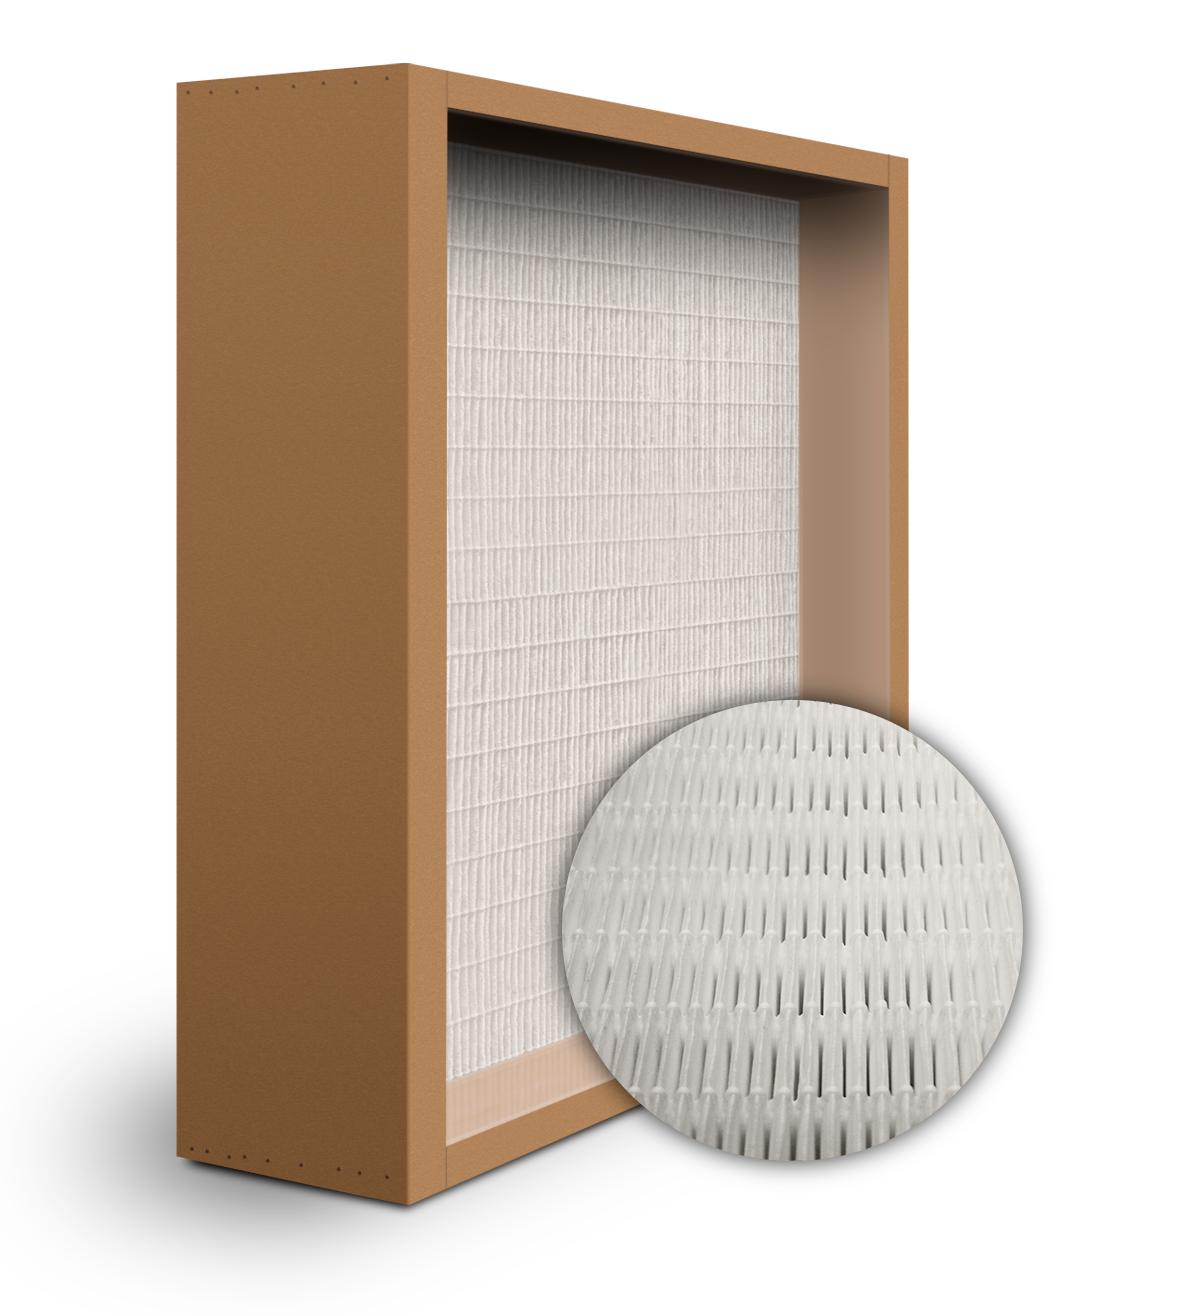 SuperFlo Max ASHRAE 95% (MERV 14/15) Particle Board Frame Mini Pleat Filter 18x24x6